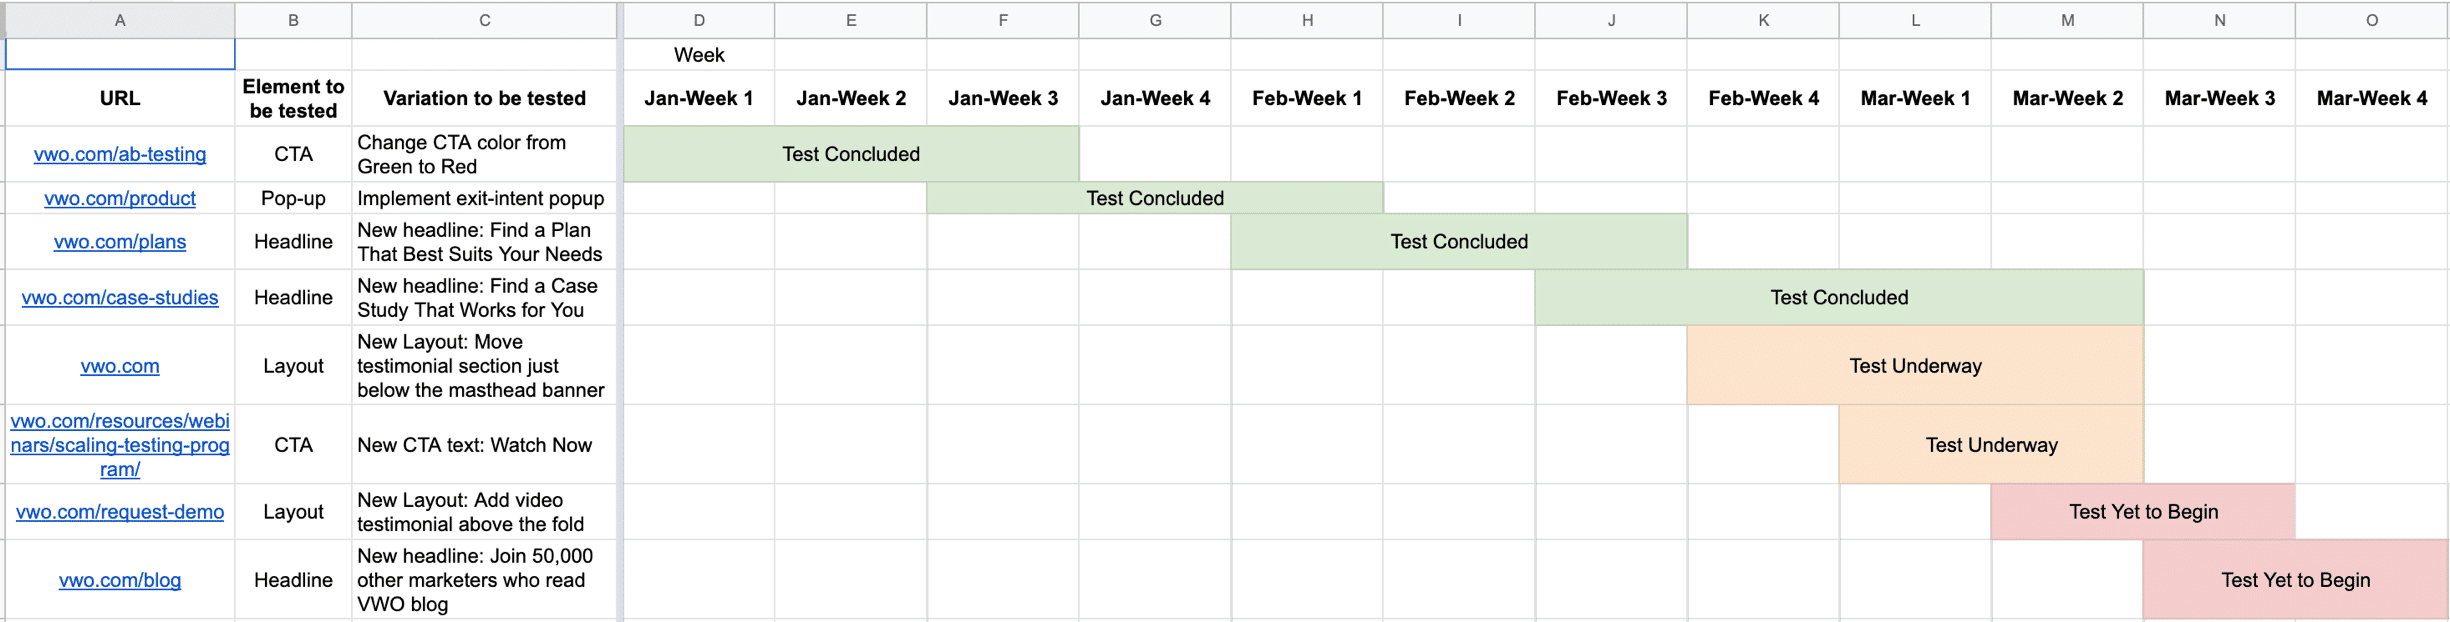 A/B testing calendar sample